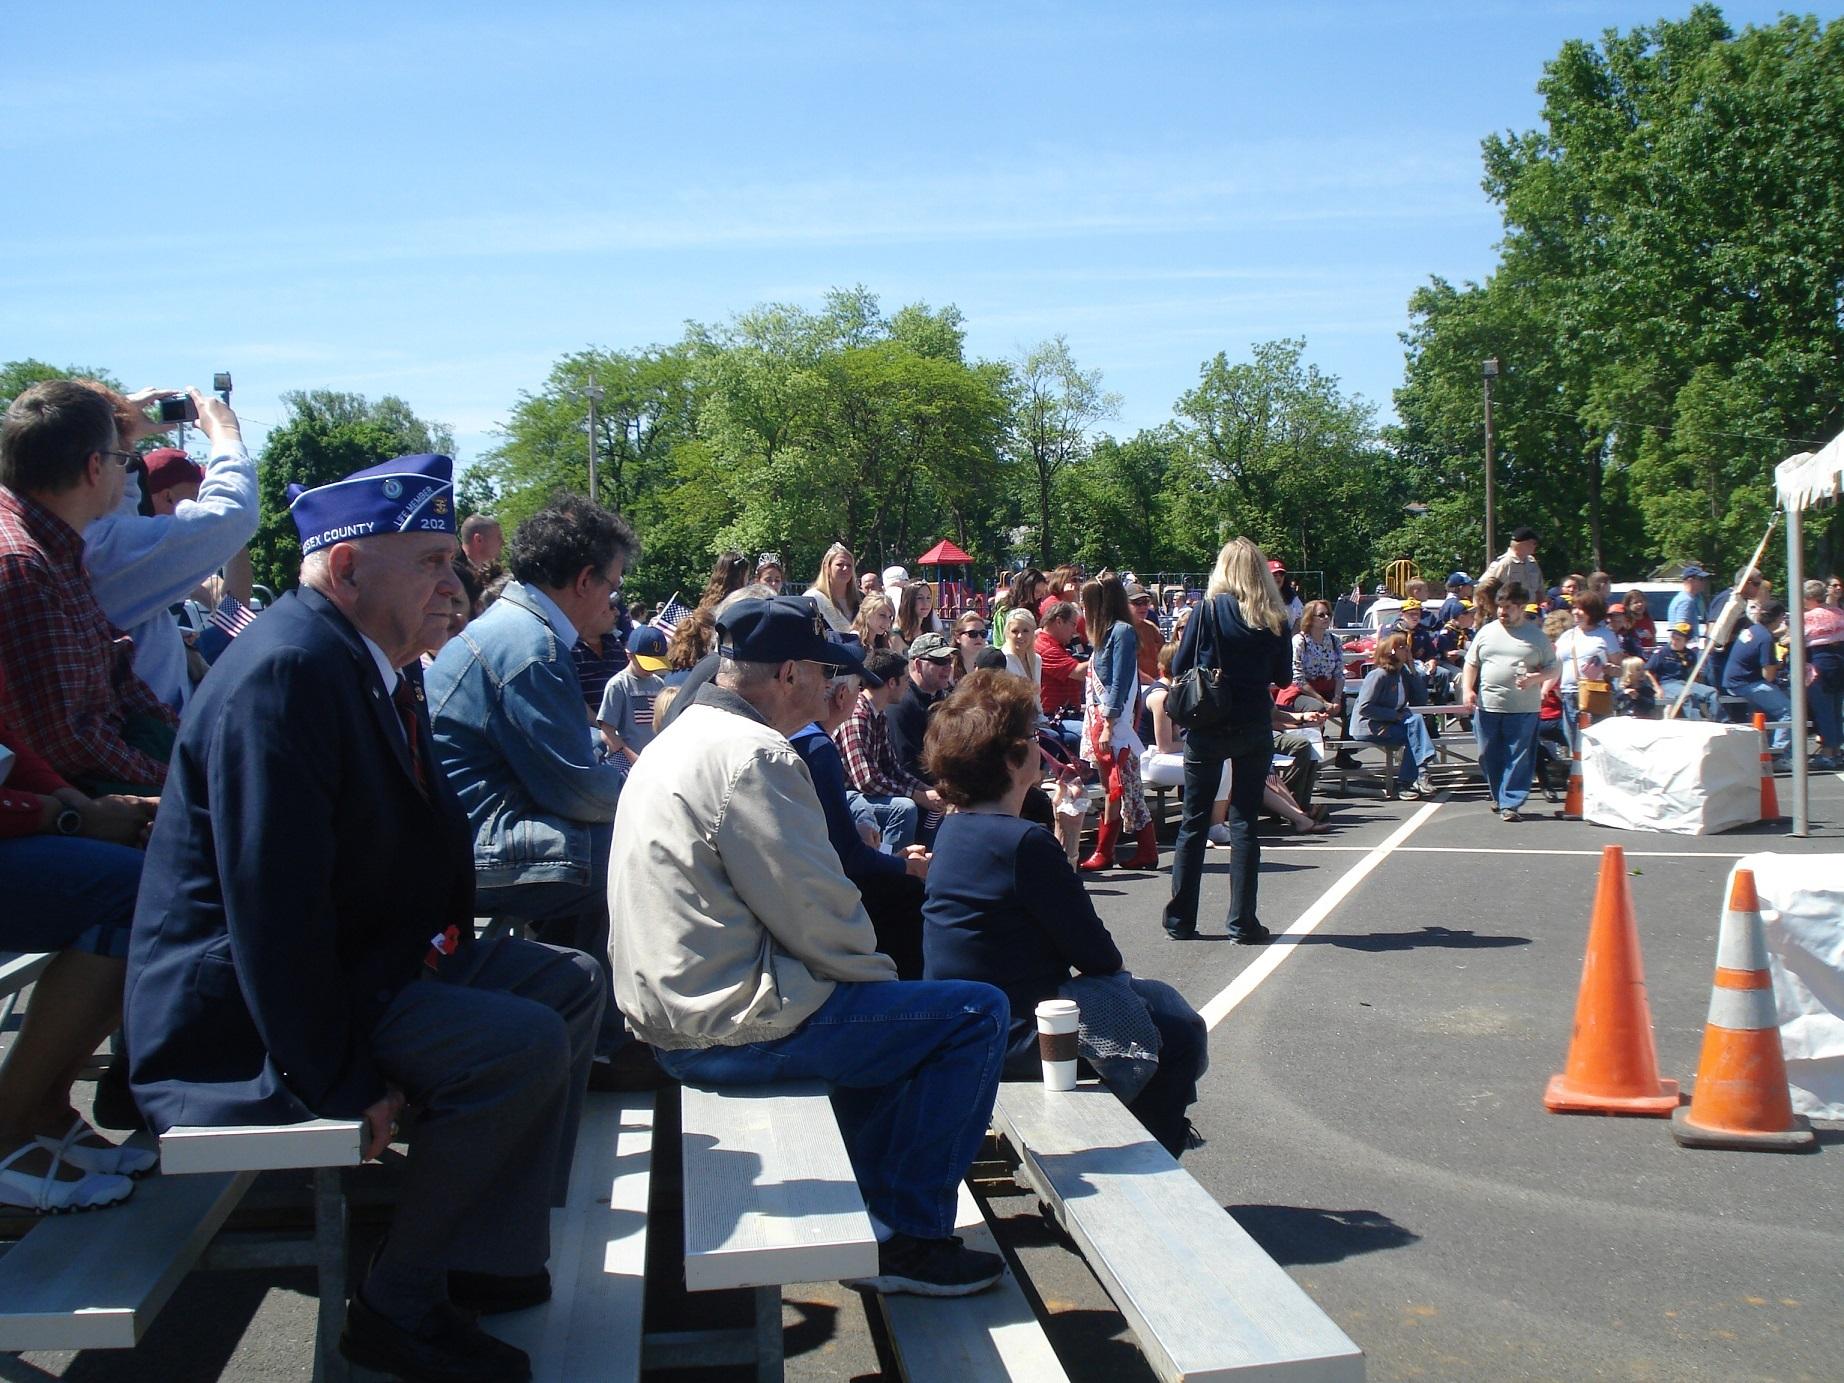 9efe1c0dc63f9cd4349d_Memorial_Day_Parade_021.JPG